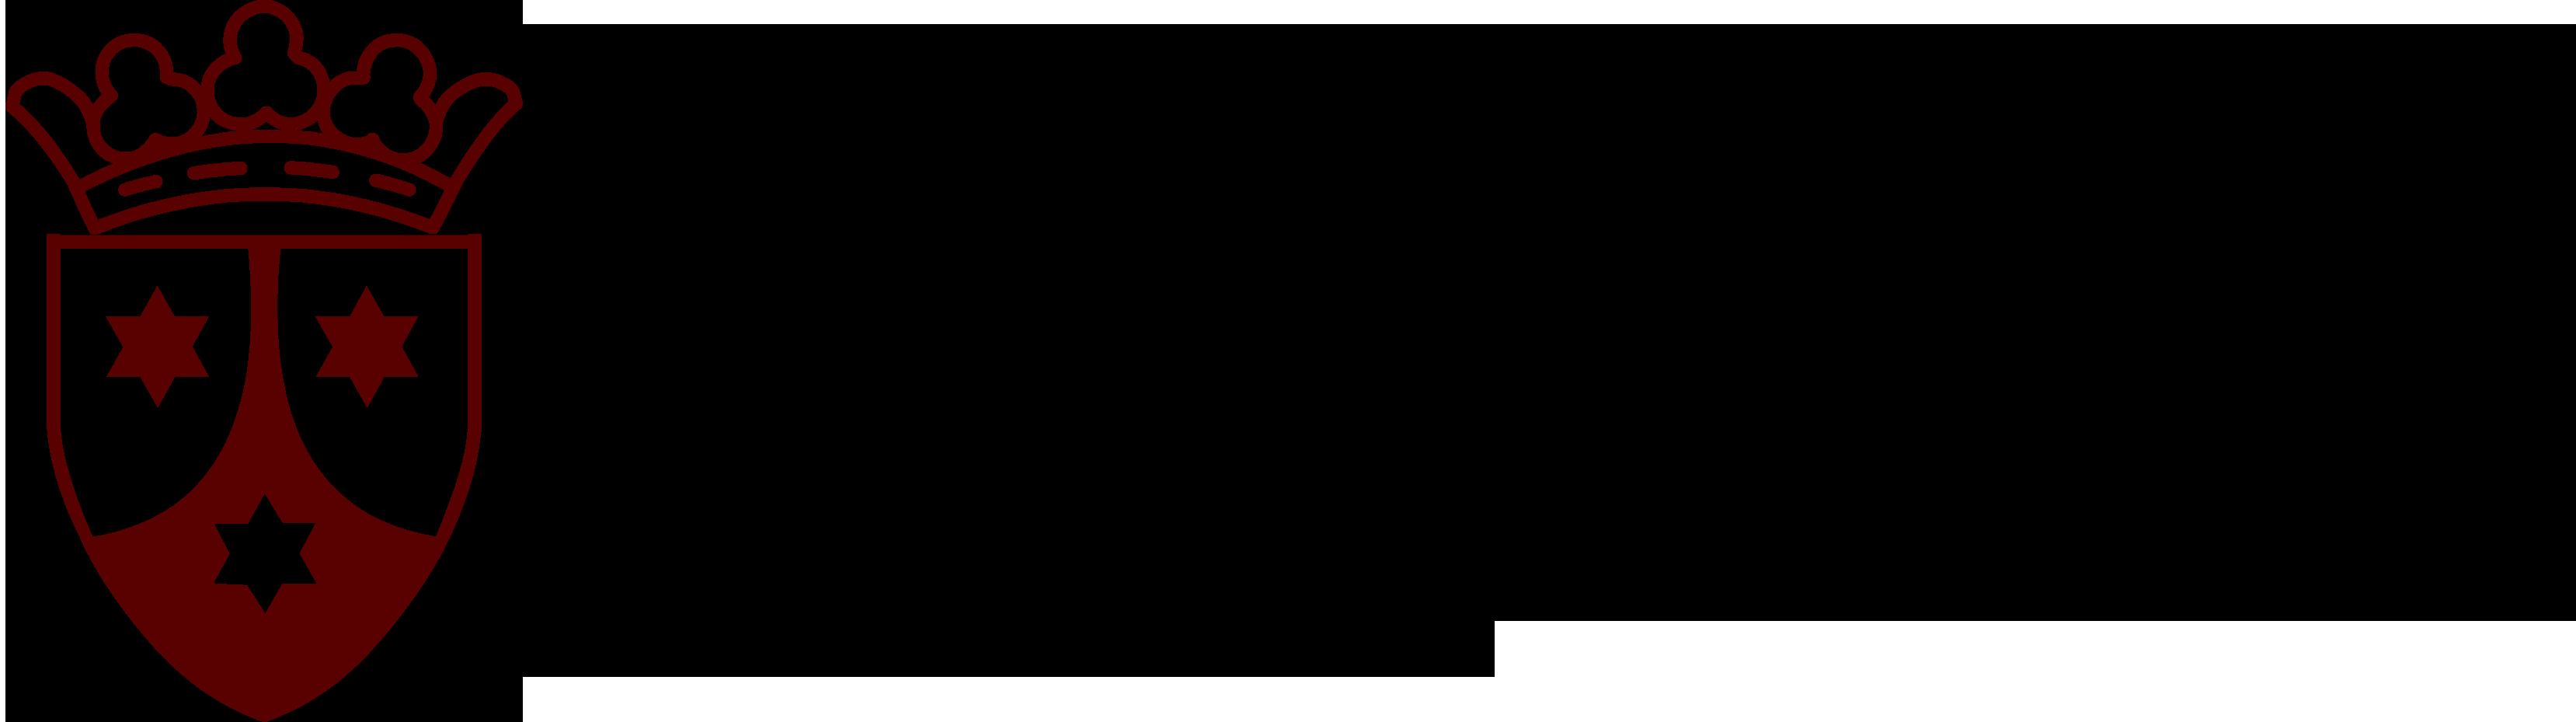 Logo Mare de Déu del Carme